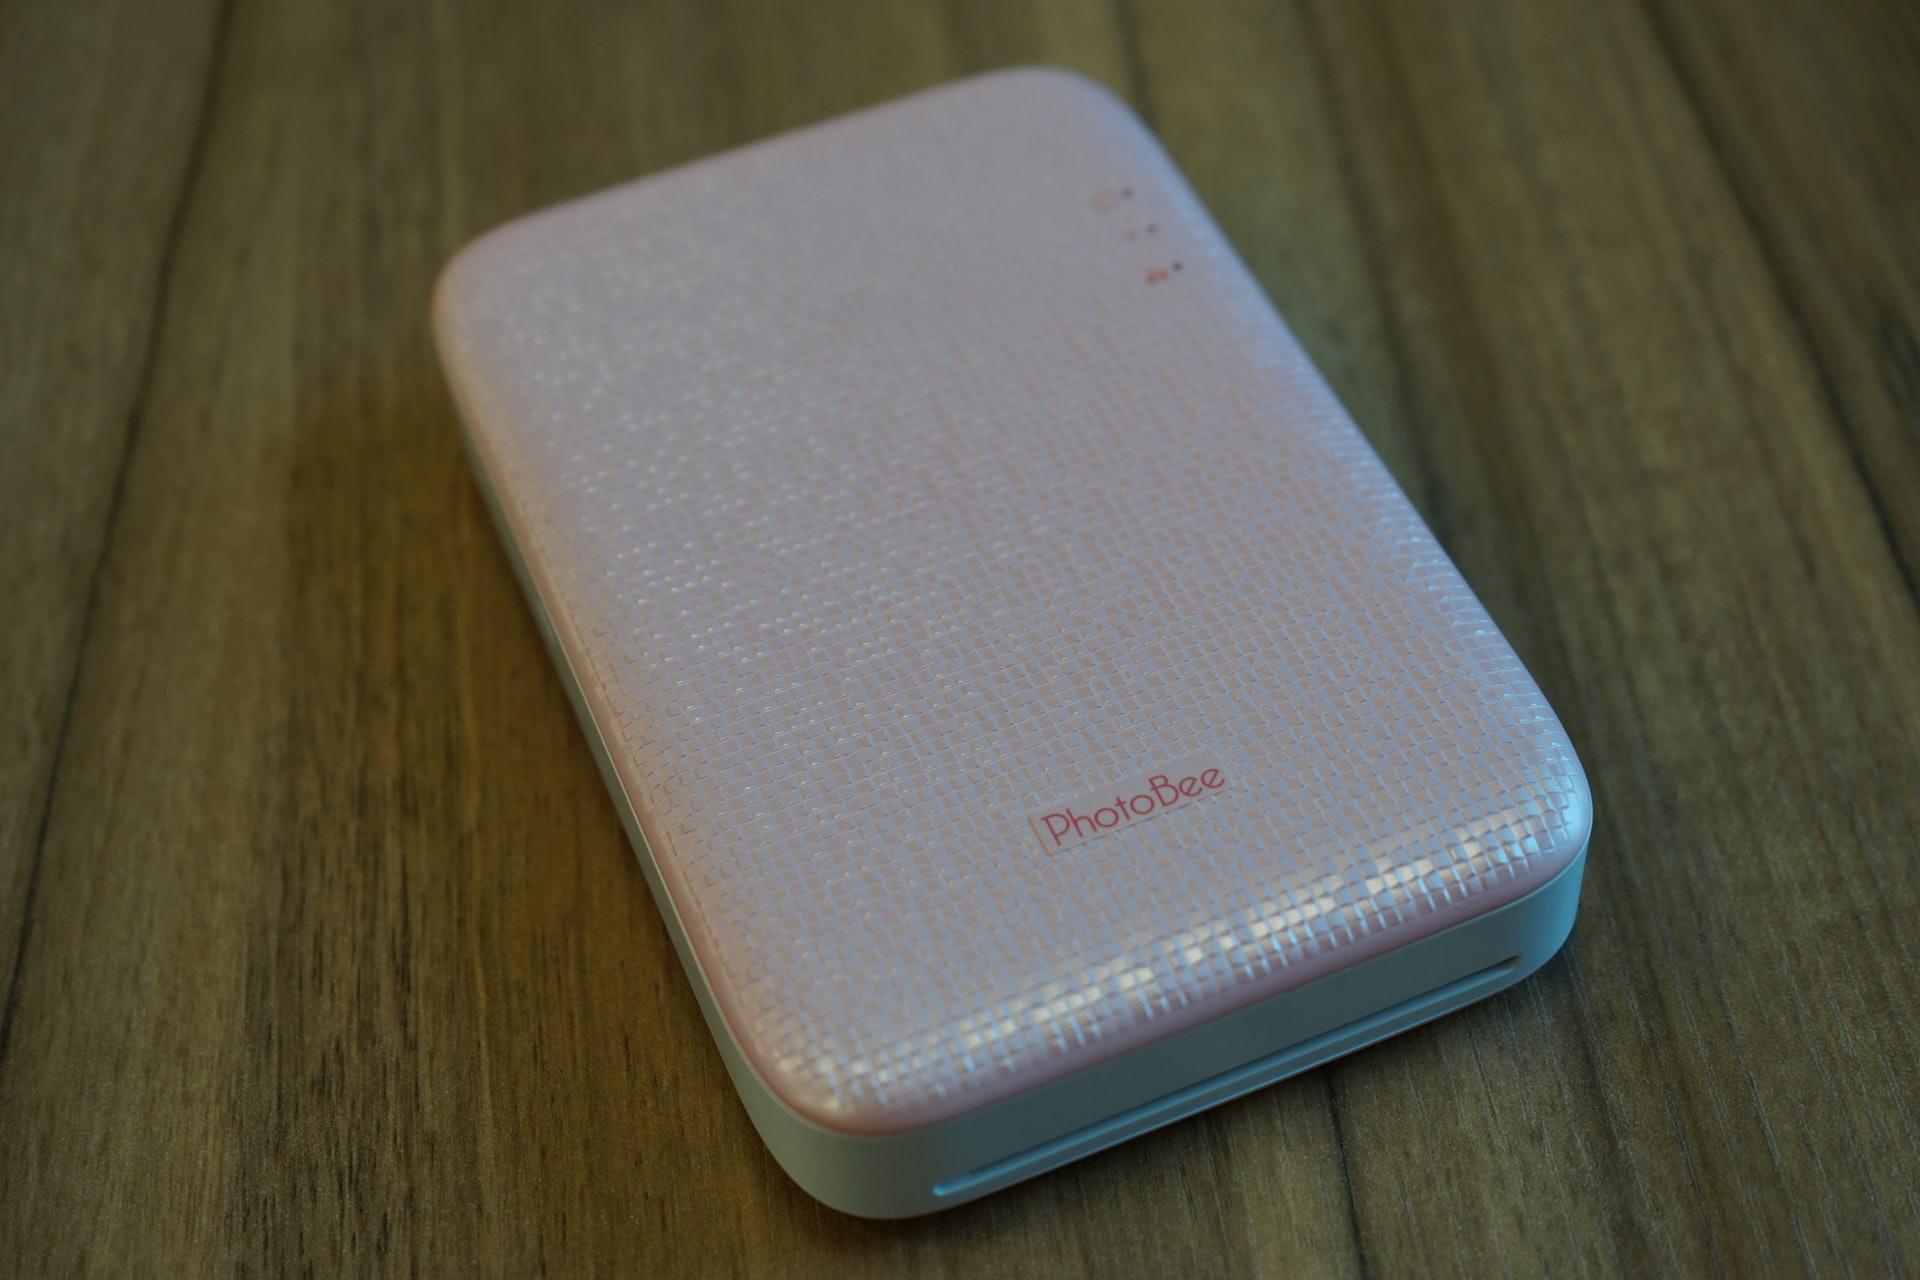 PhotoBee外型設計如一般外置硬碟。 (鄧鴻至 攝)